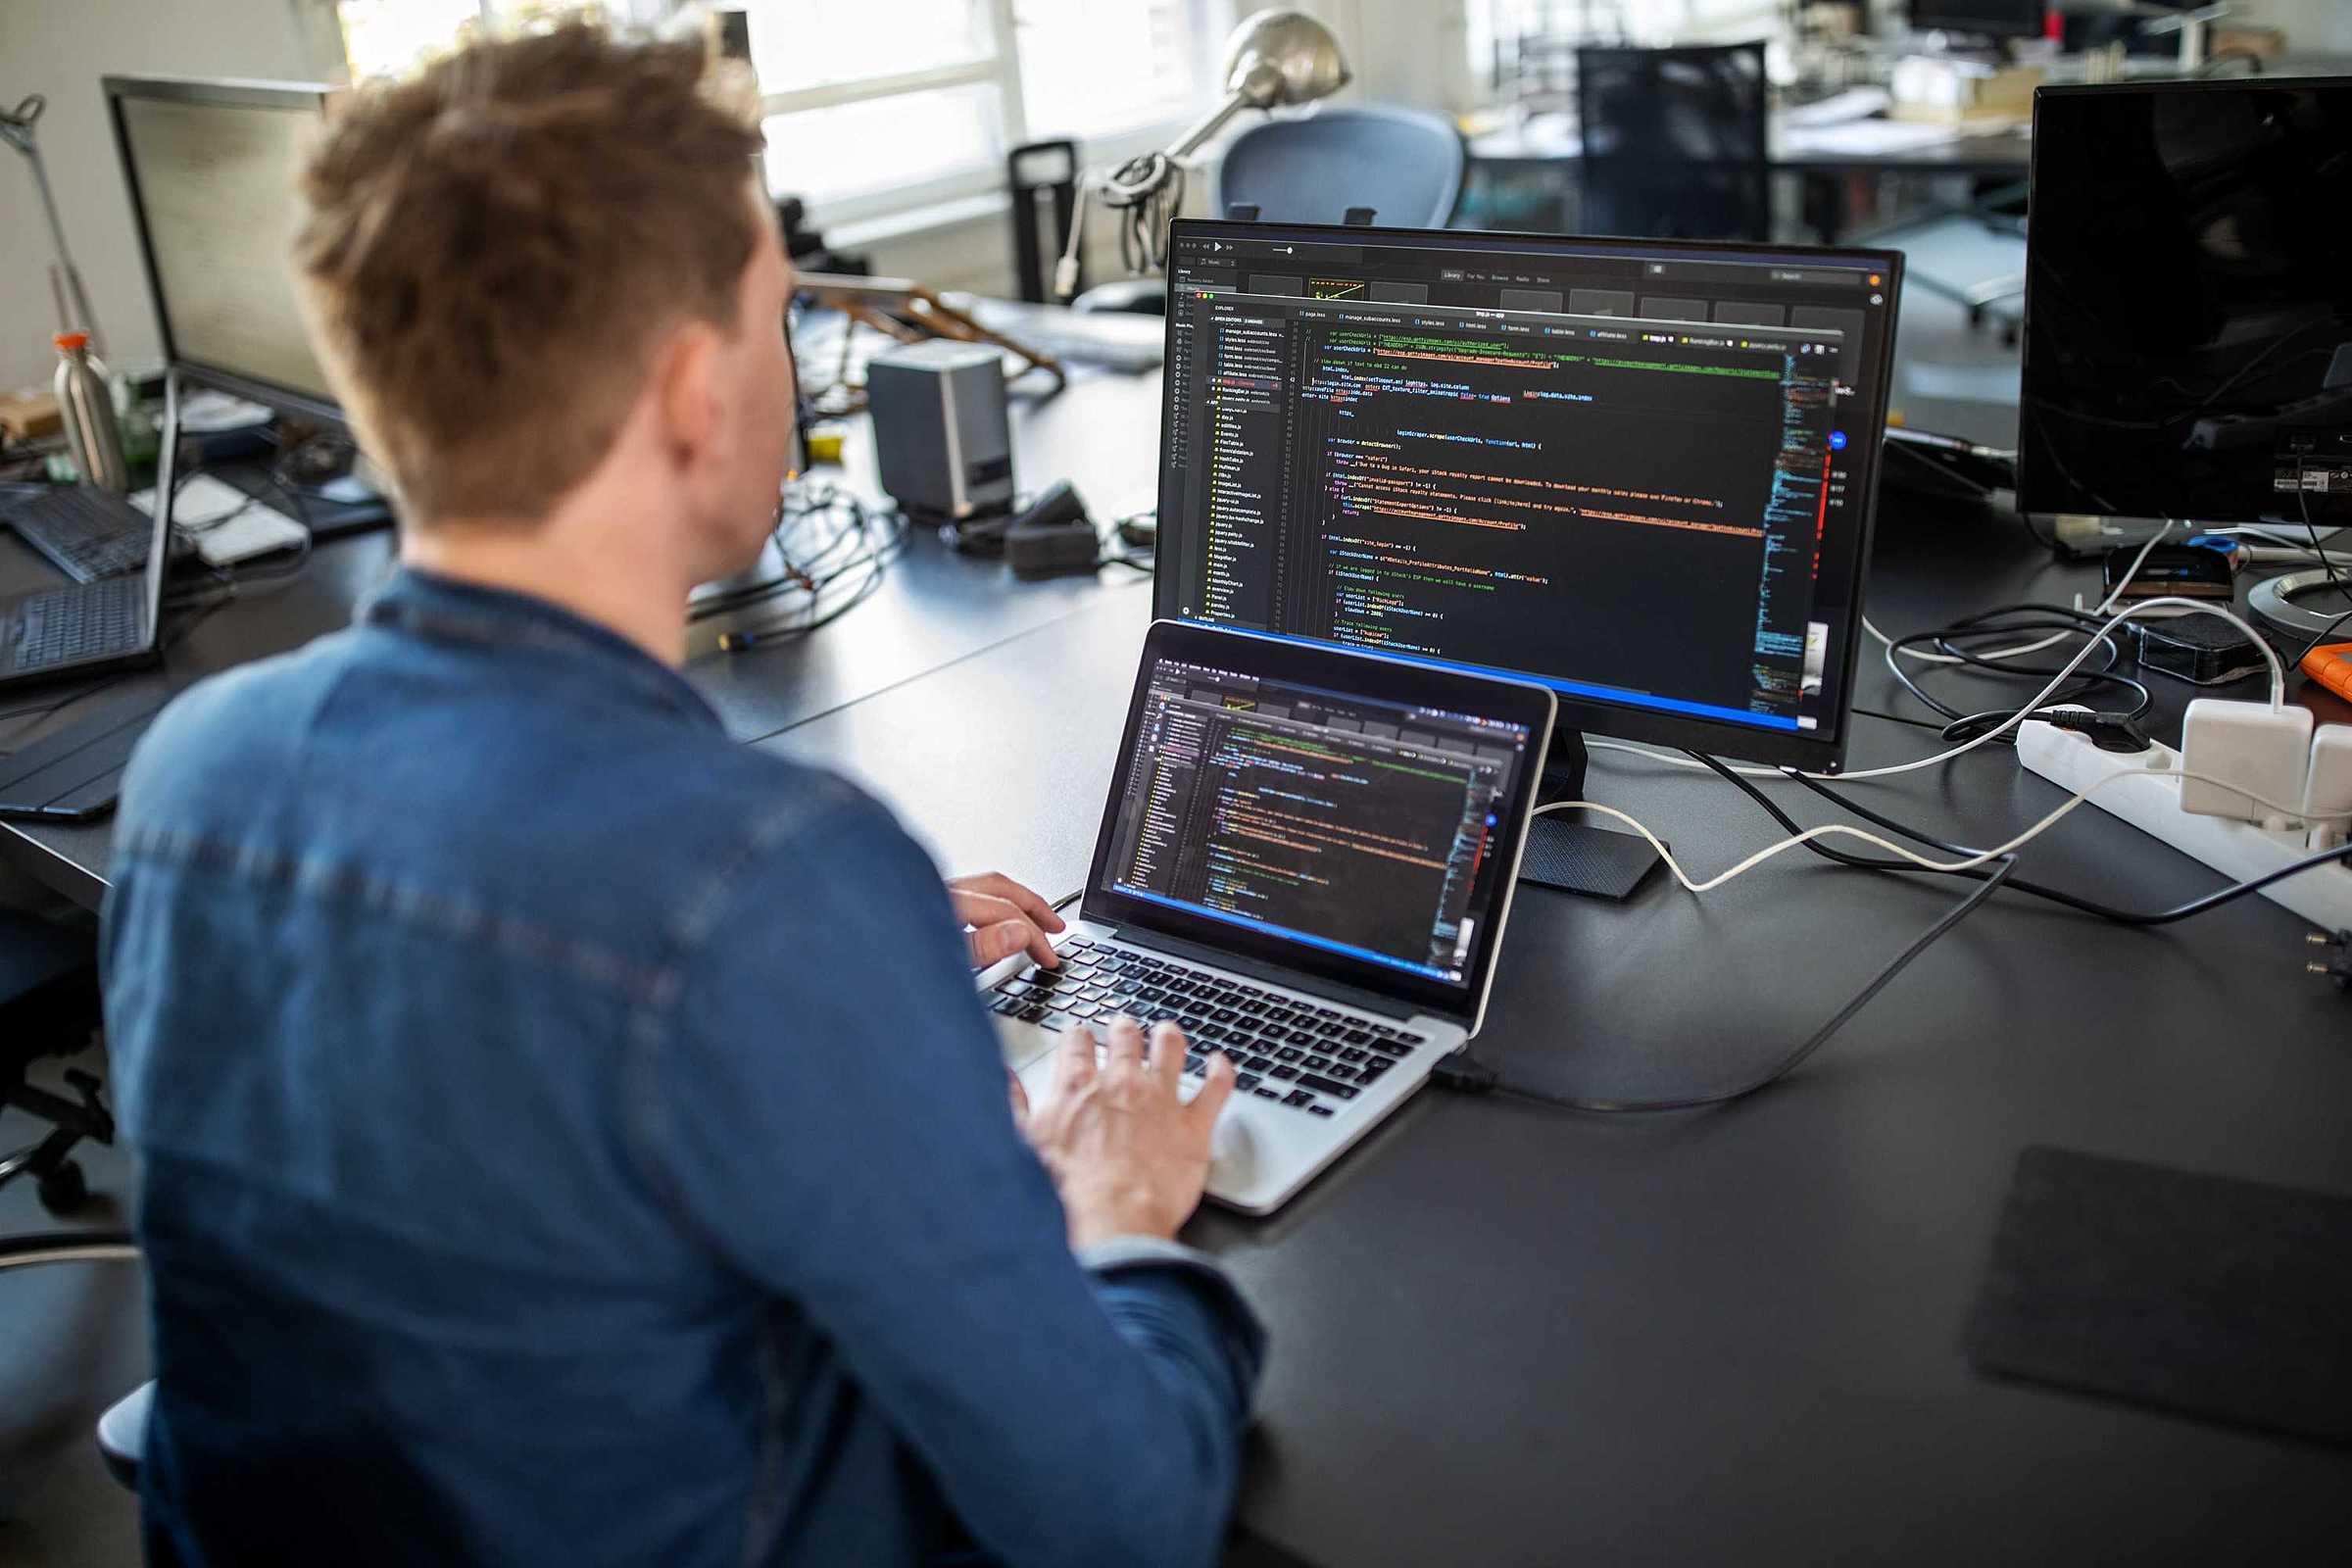 Criptografia de dados: entenda como realizar na sua empresa